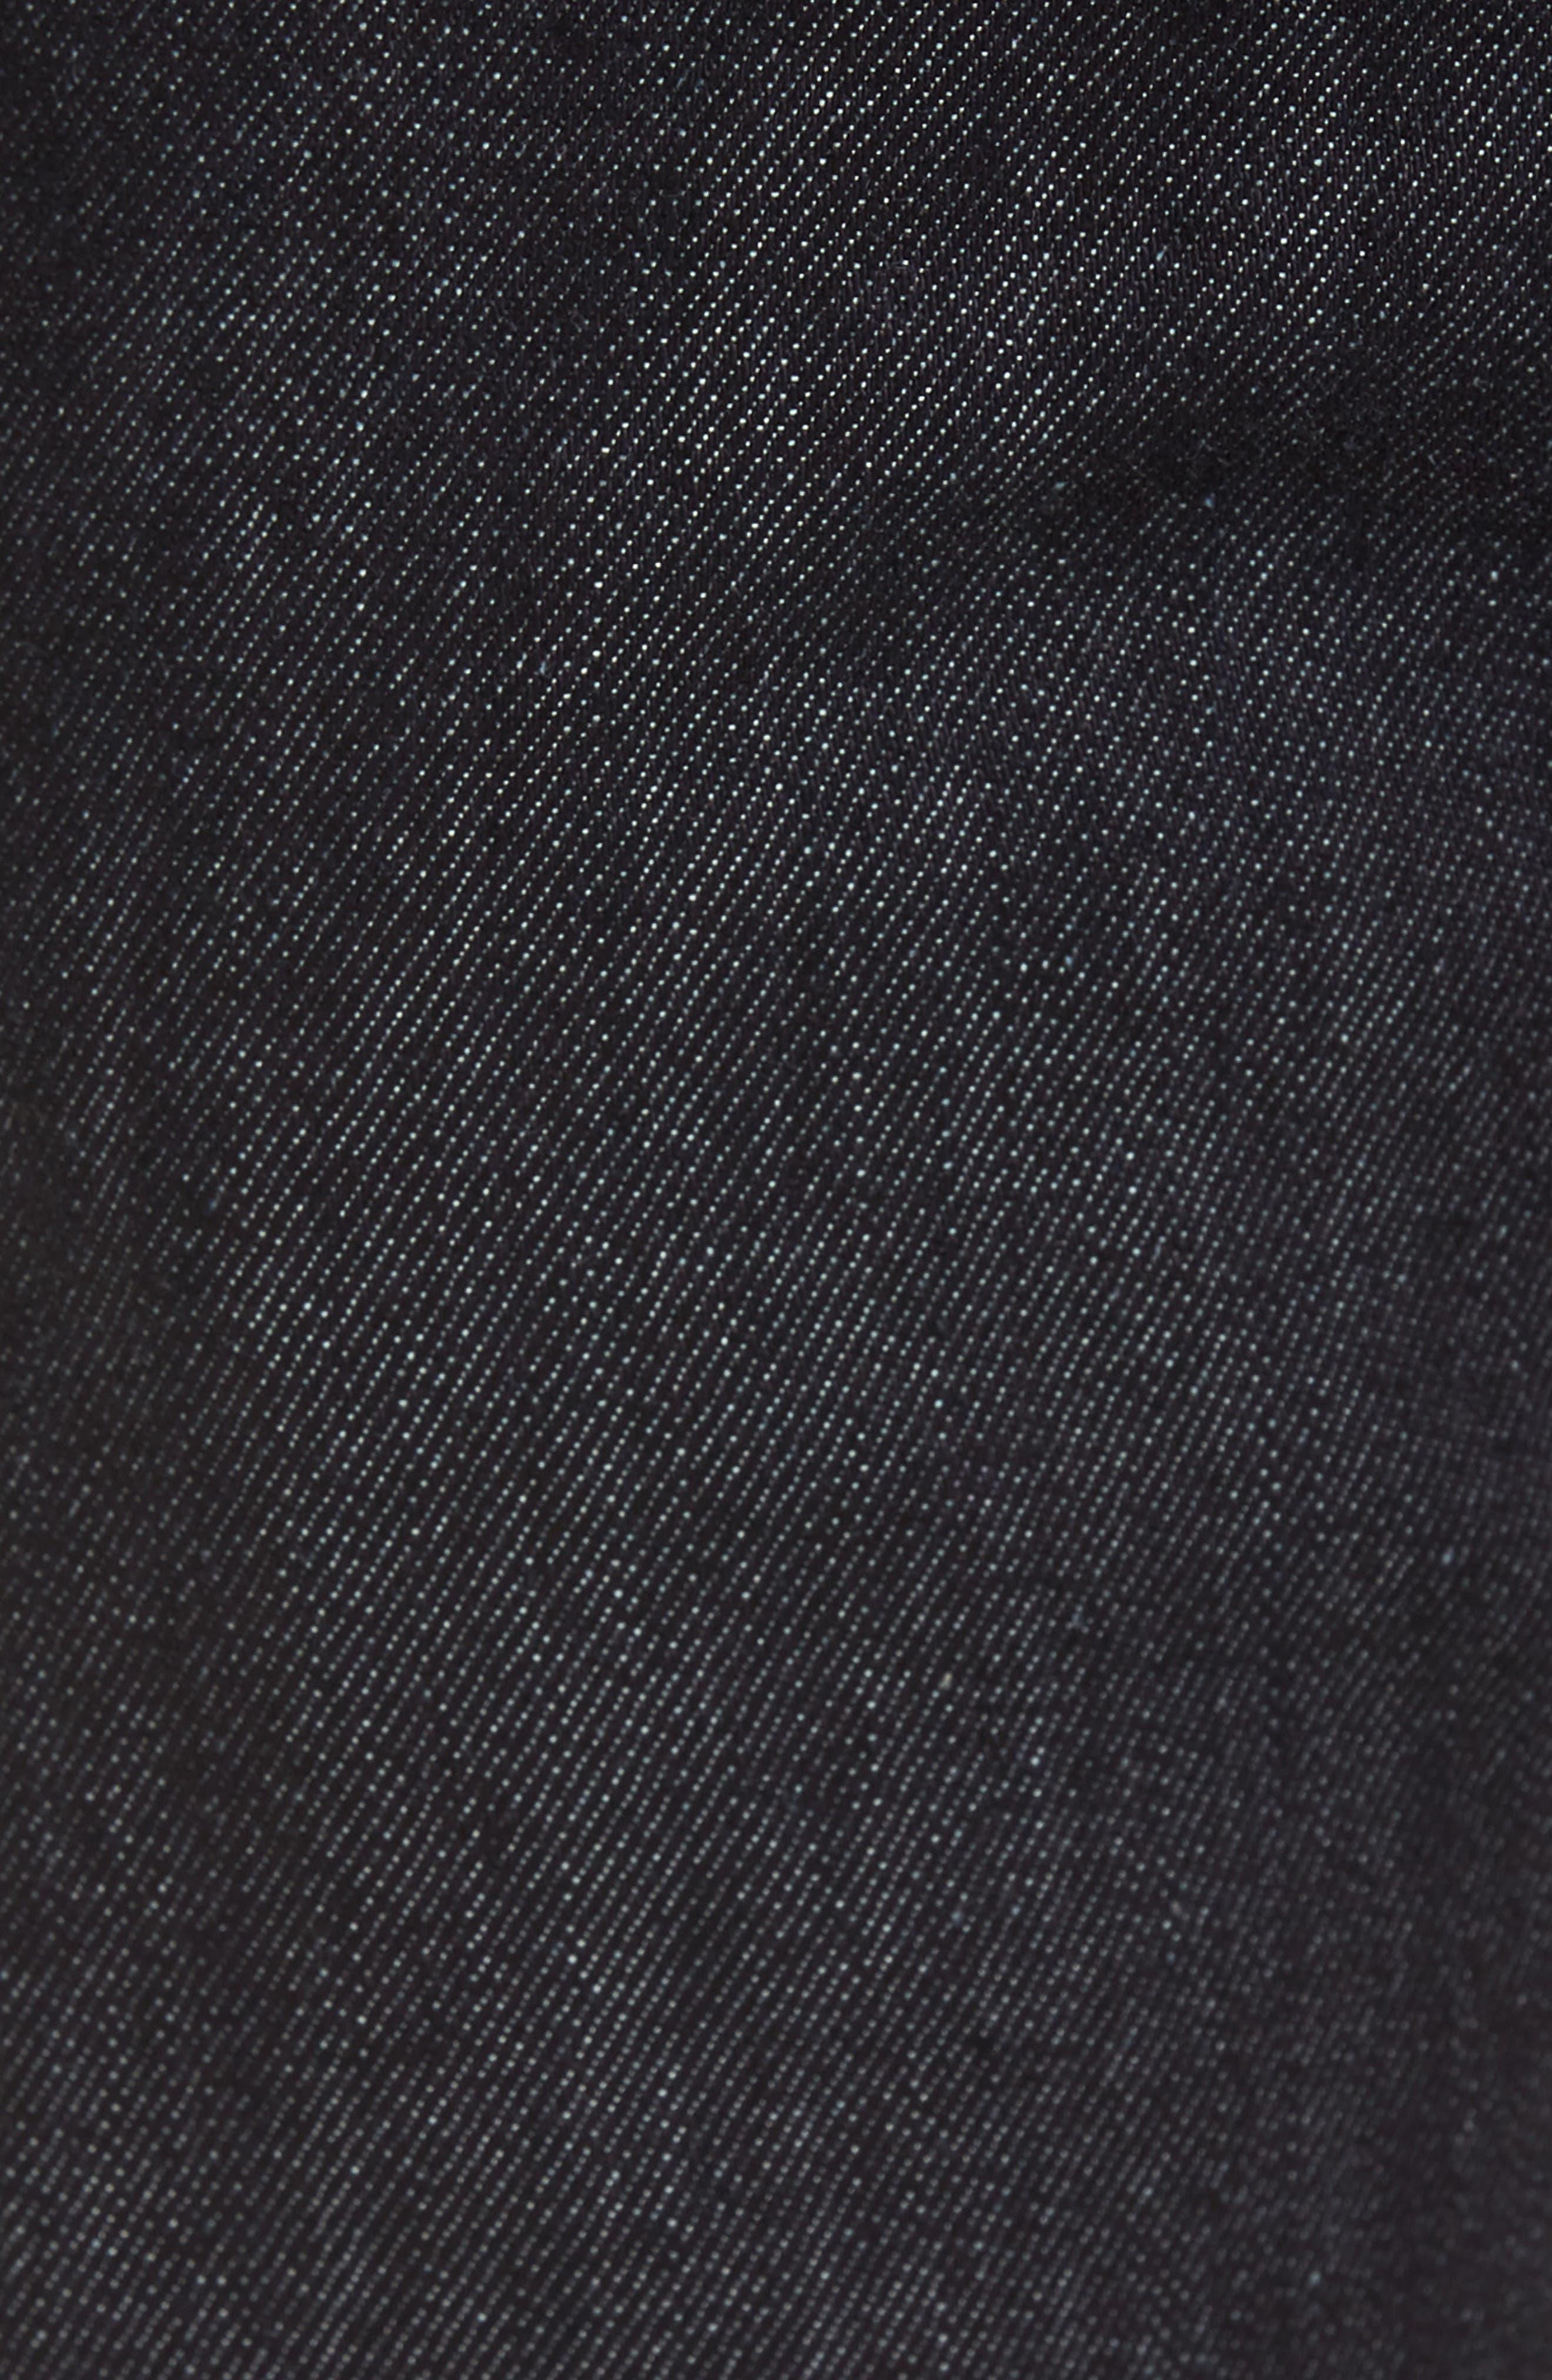 V76 Skinny Jeans,                             Alternate thumbnail 5, color,                             Indigo